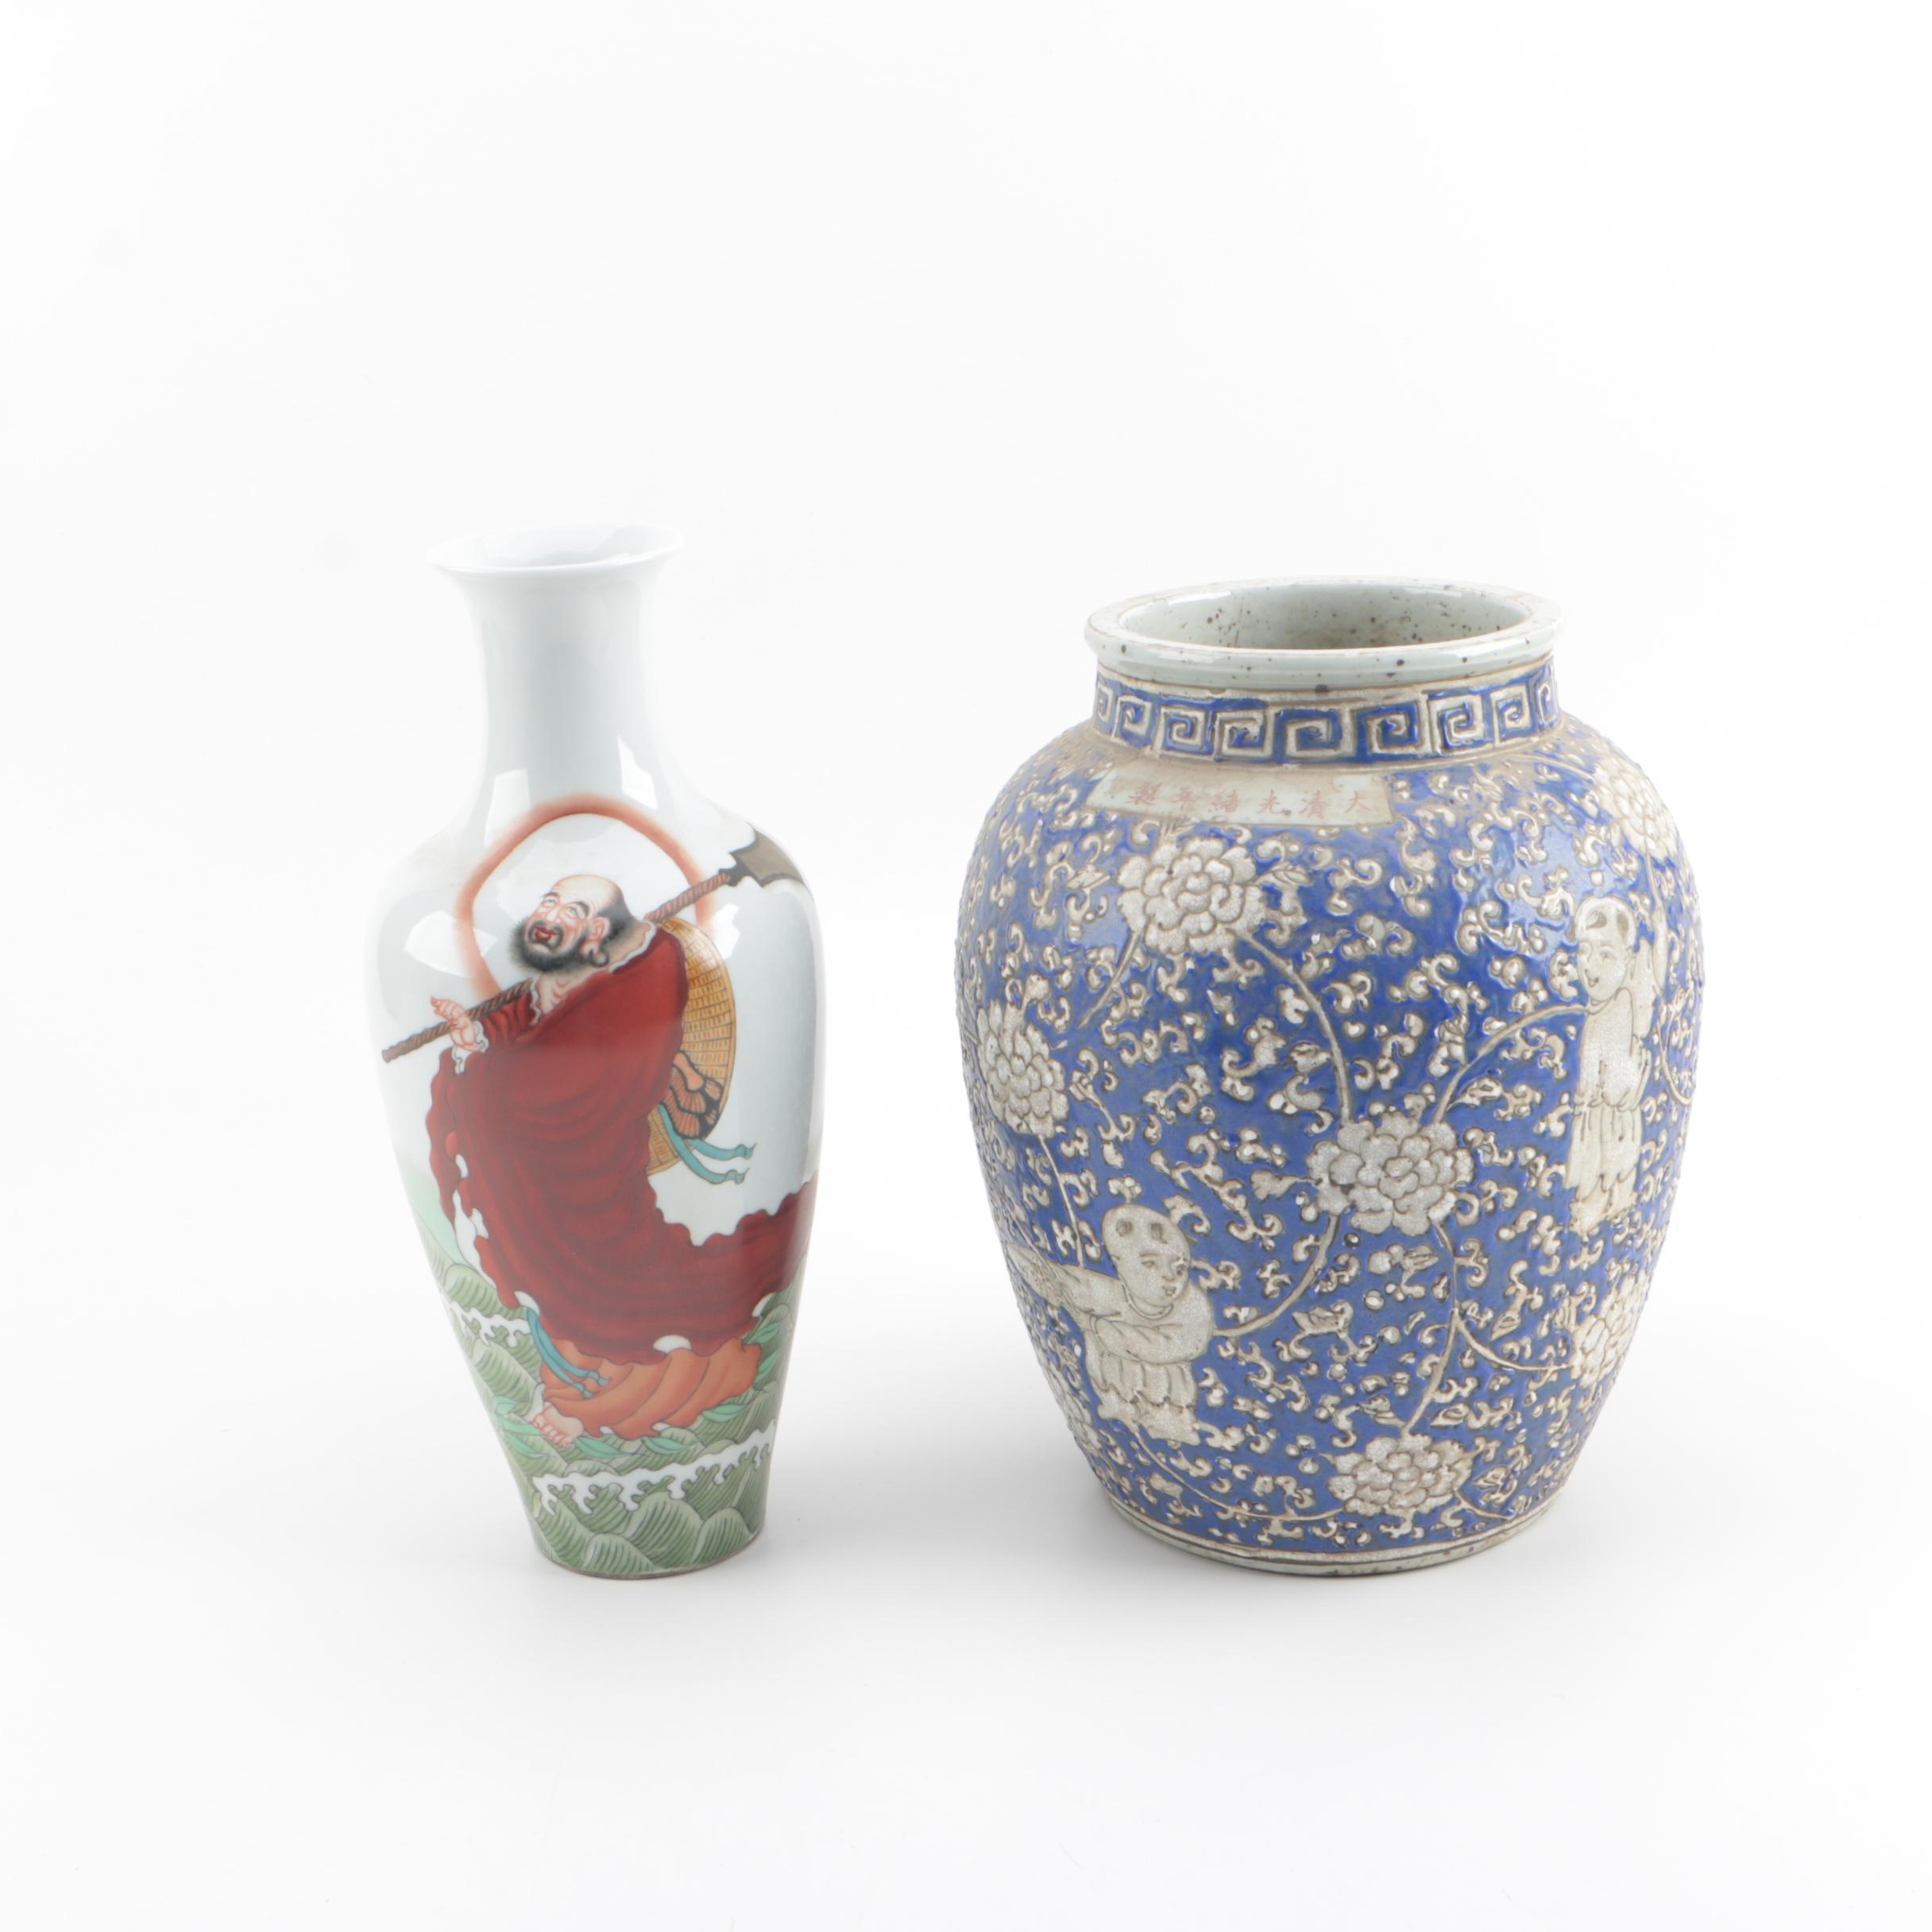 Chinese Figurative Porcelain and Stoneware Vases